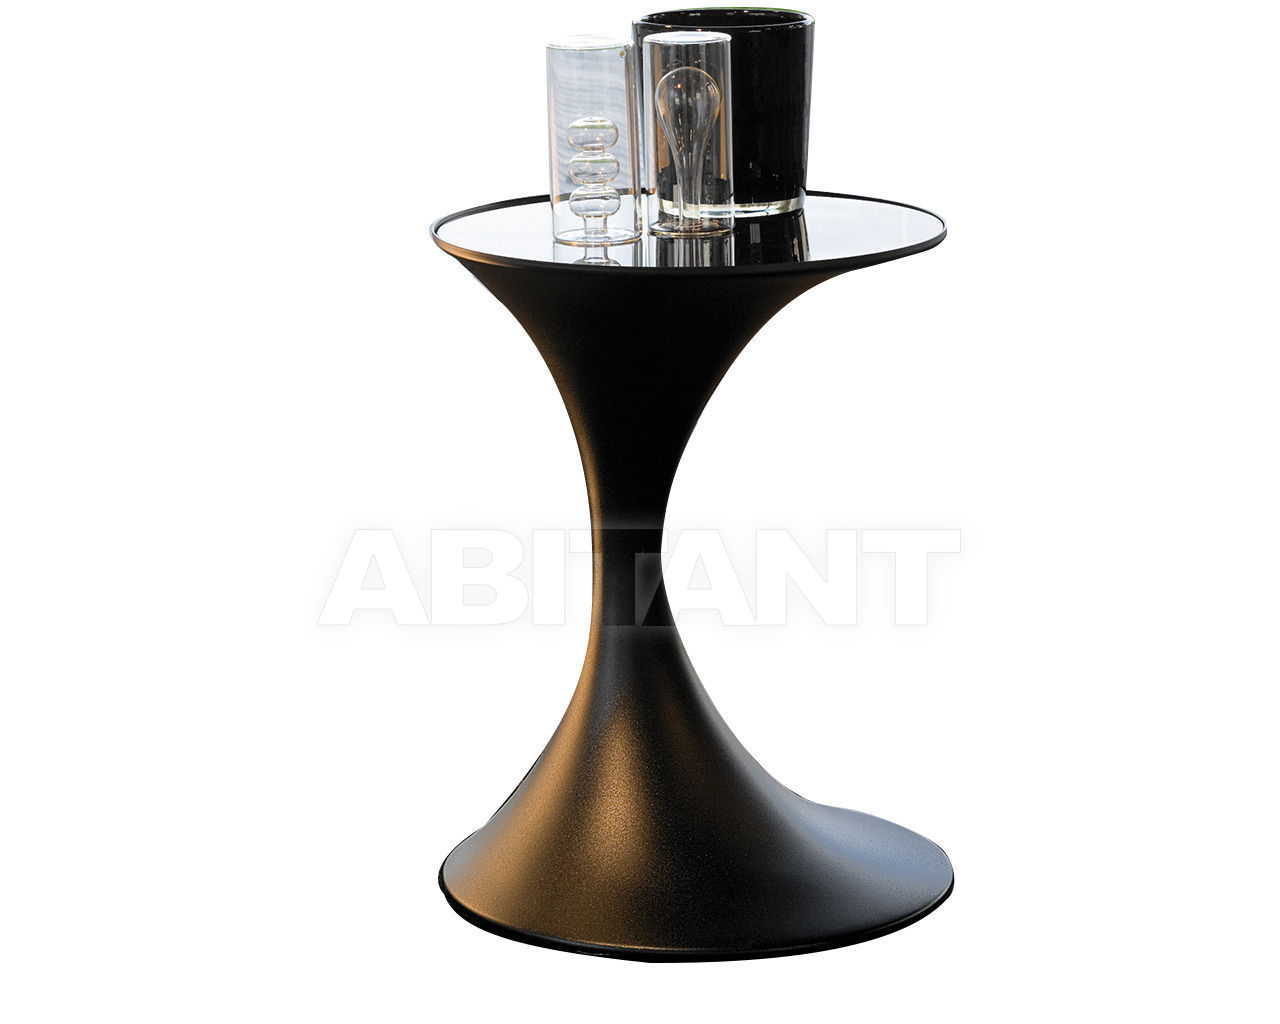 Купить Столик кофейный Andorra  Tonin Casa Rossa 6293 V2